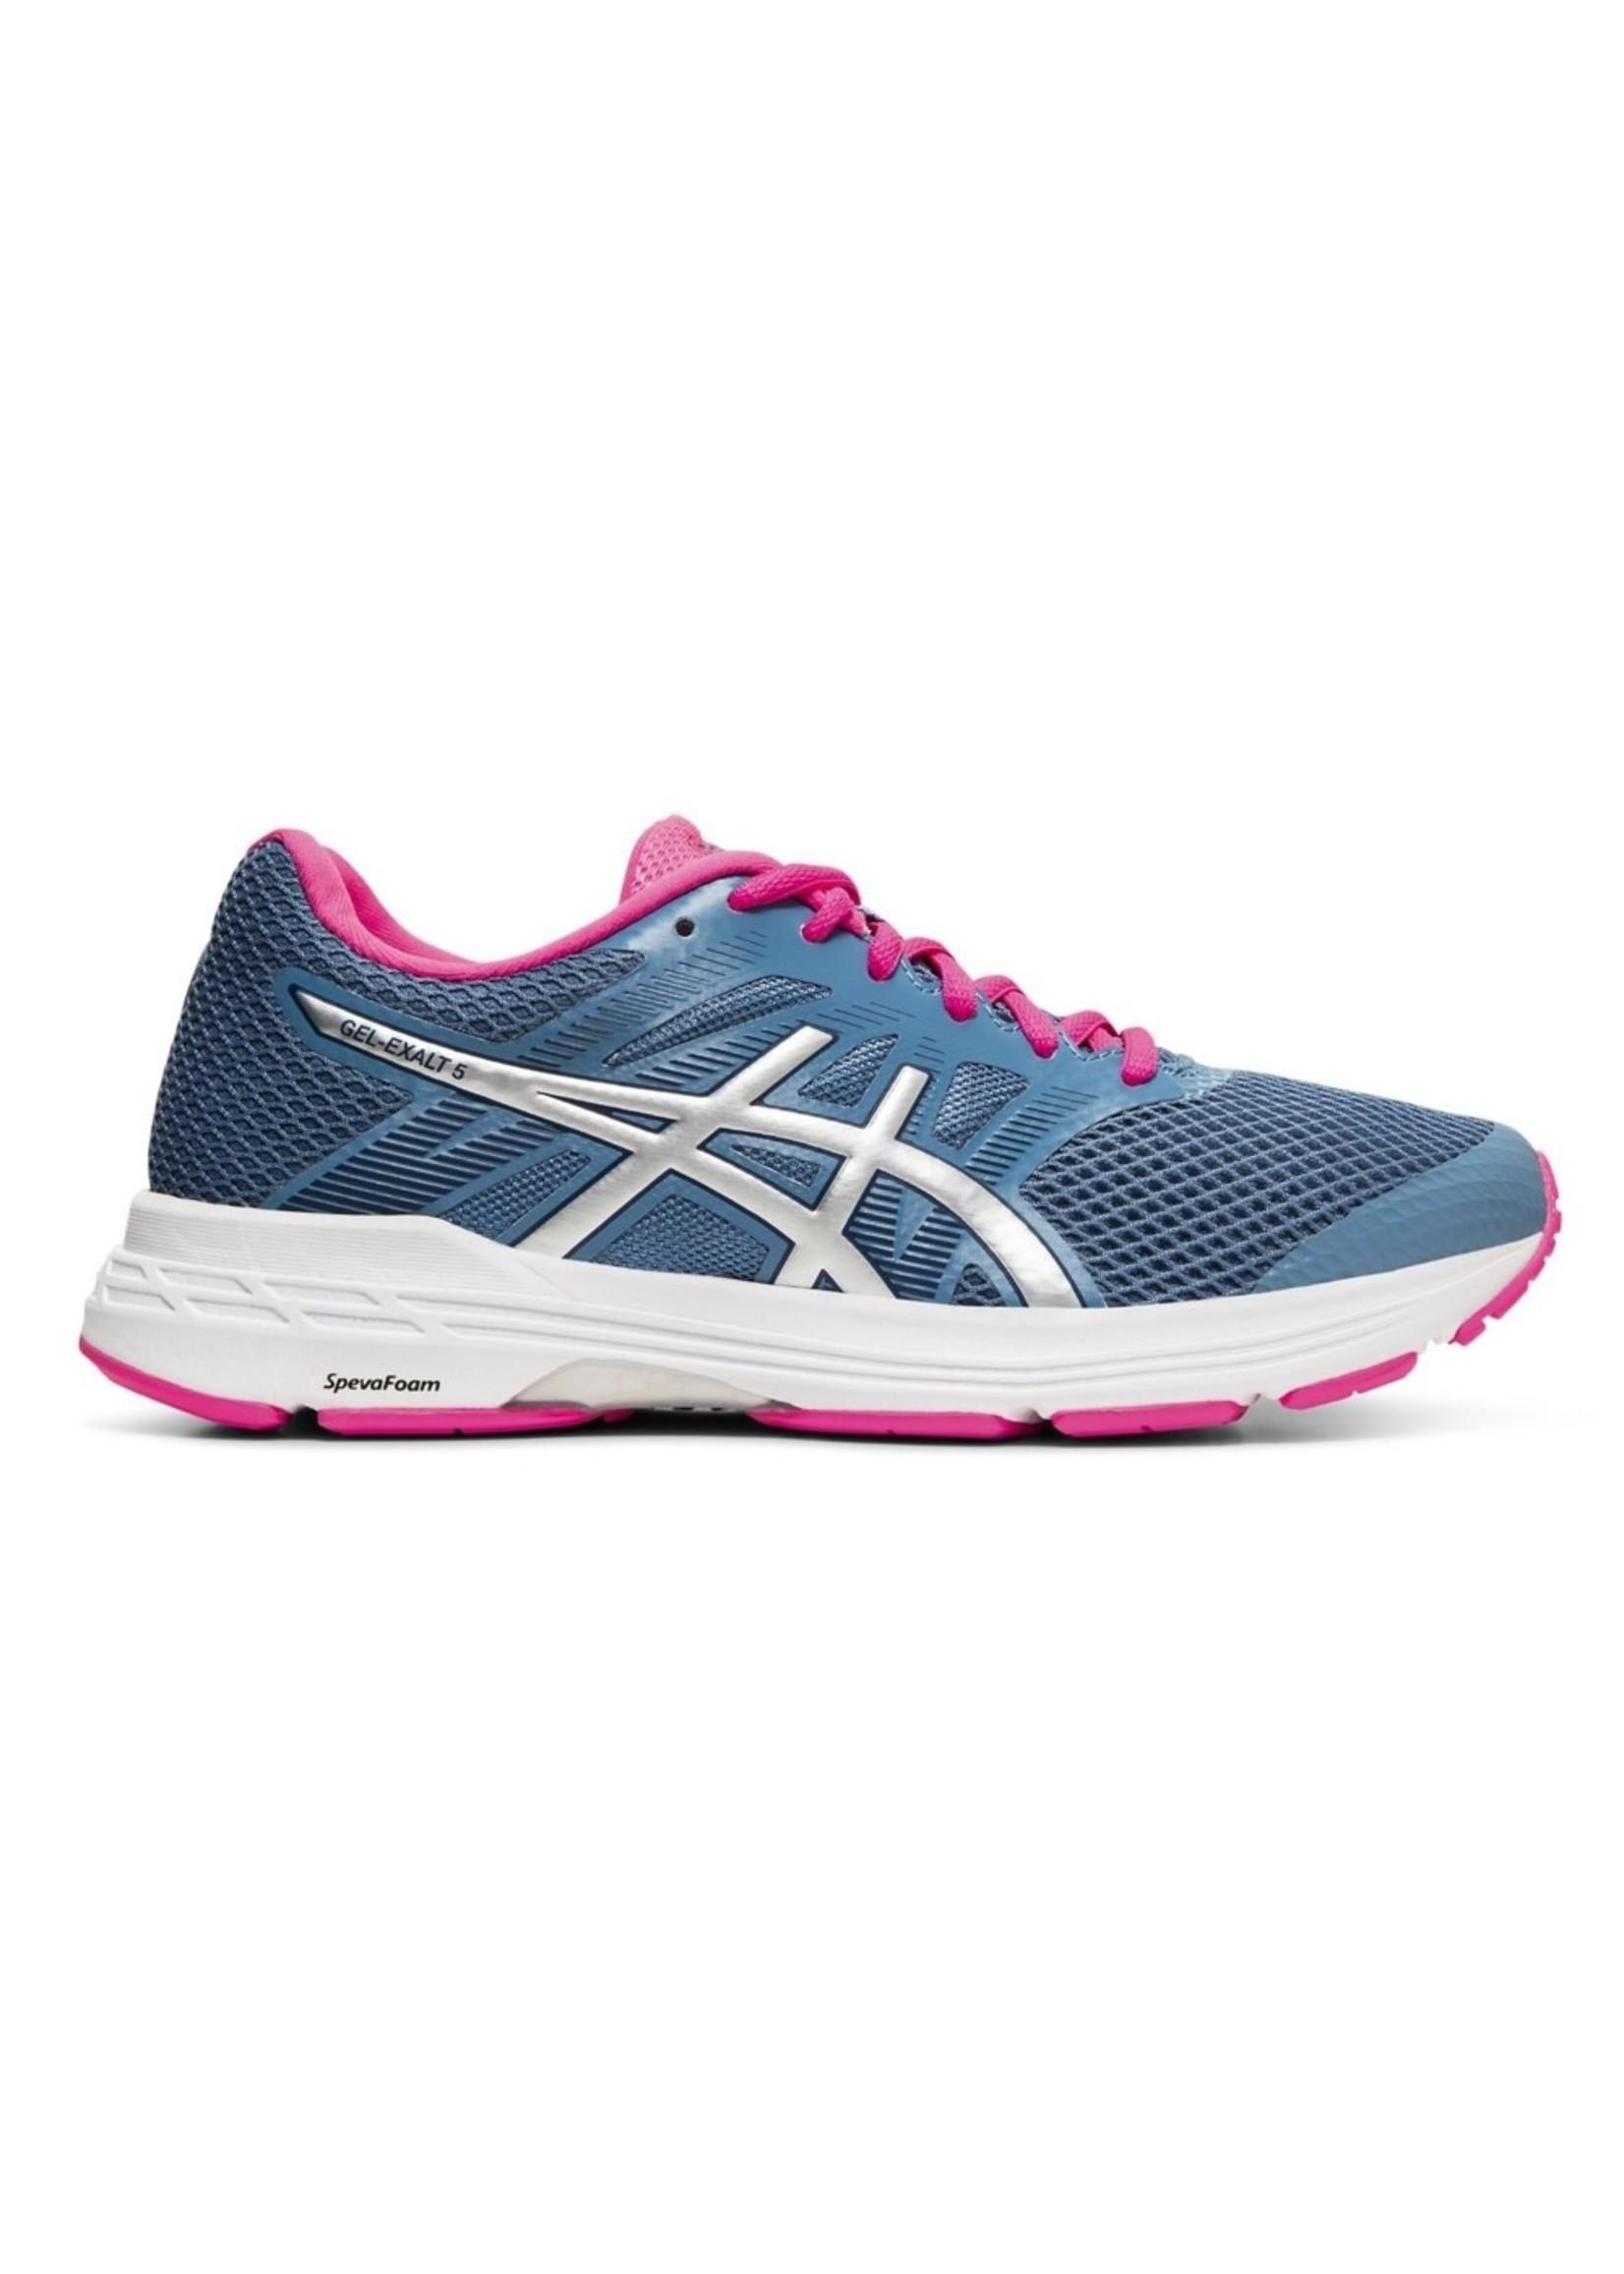 Asics Asics Gel-Exalt 5 Ladies Running Shoe (2020), Grey Floss/Silver